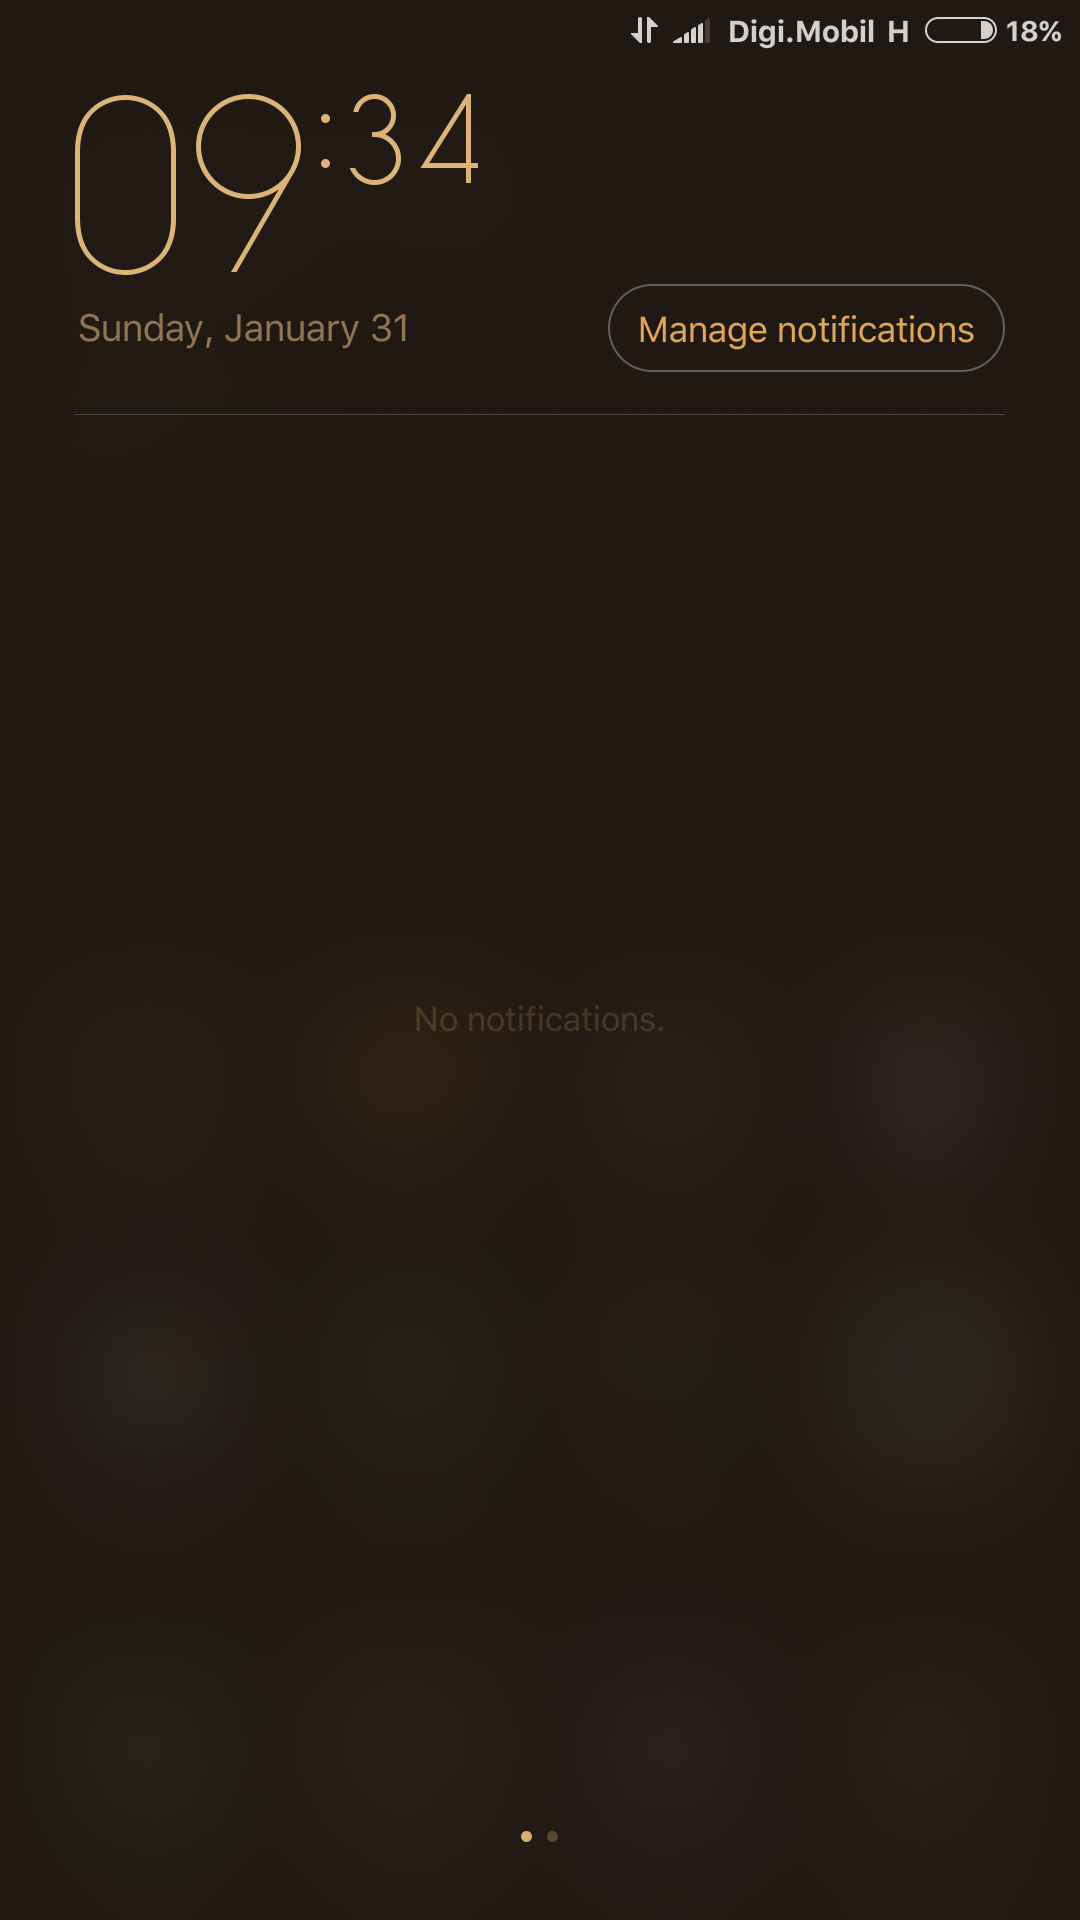 Instalare custom firmware MIUI 7 pentru Allview X2 Soul, Android 4.4.2